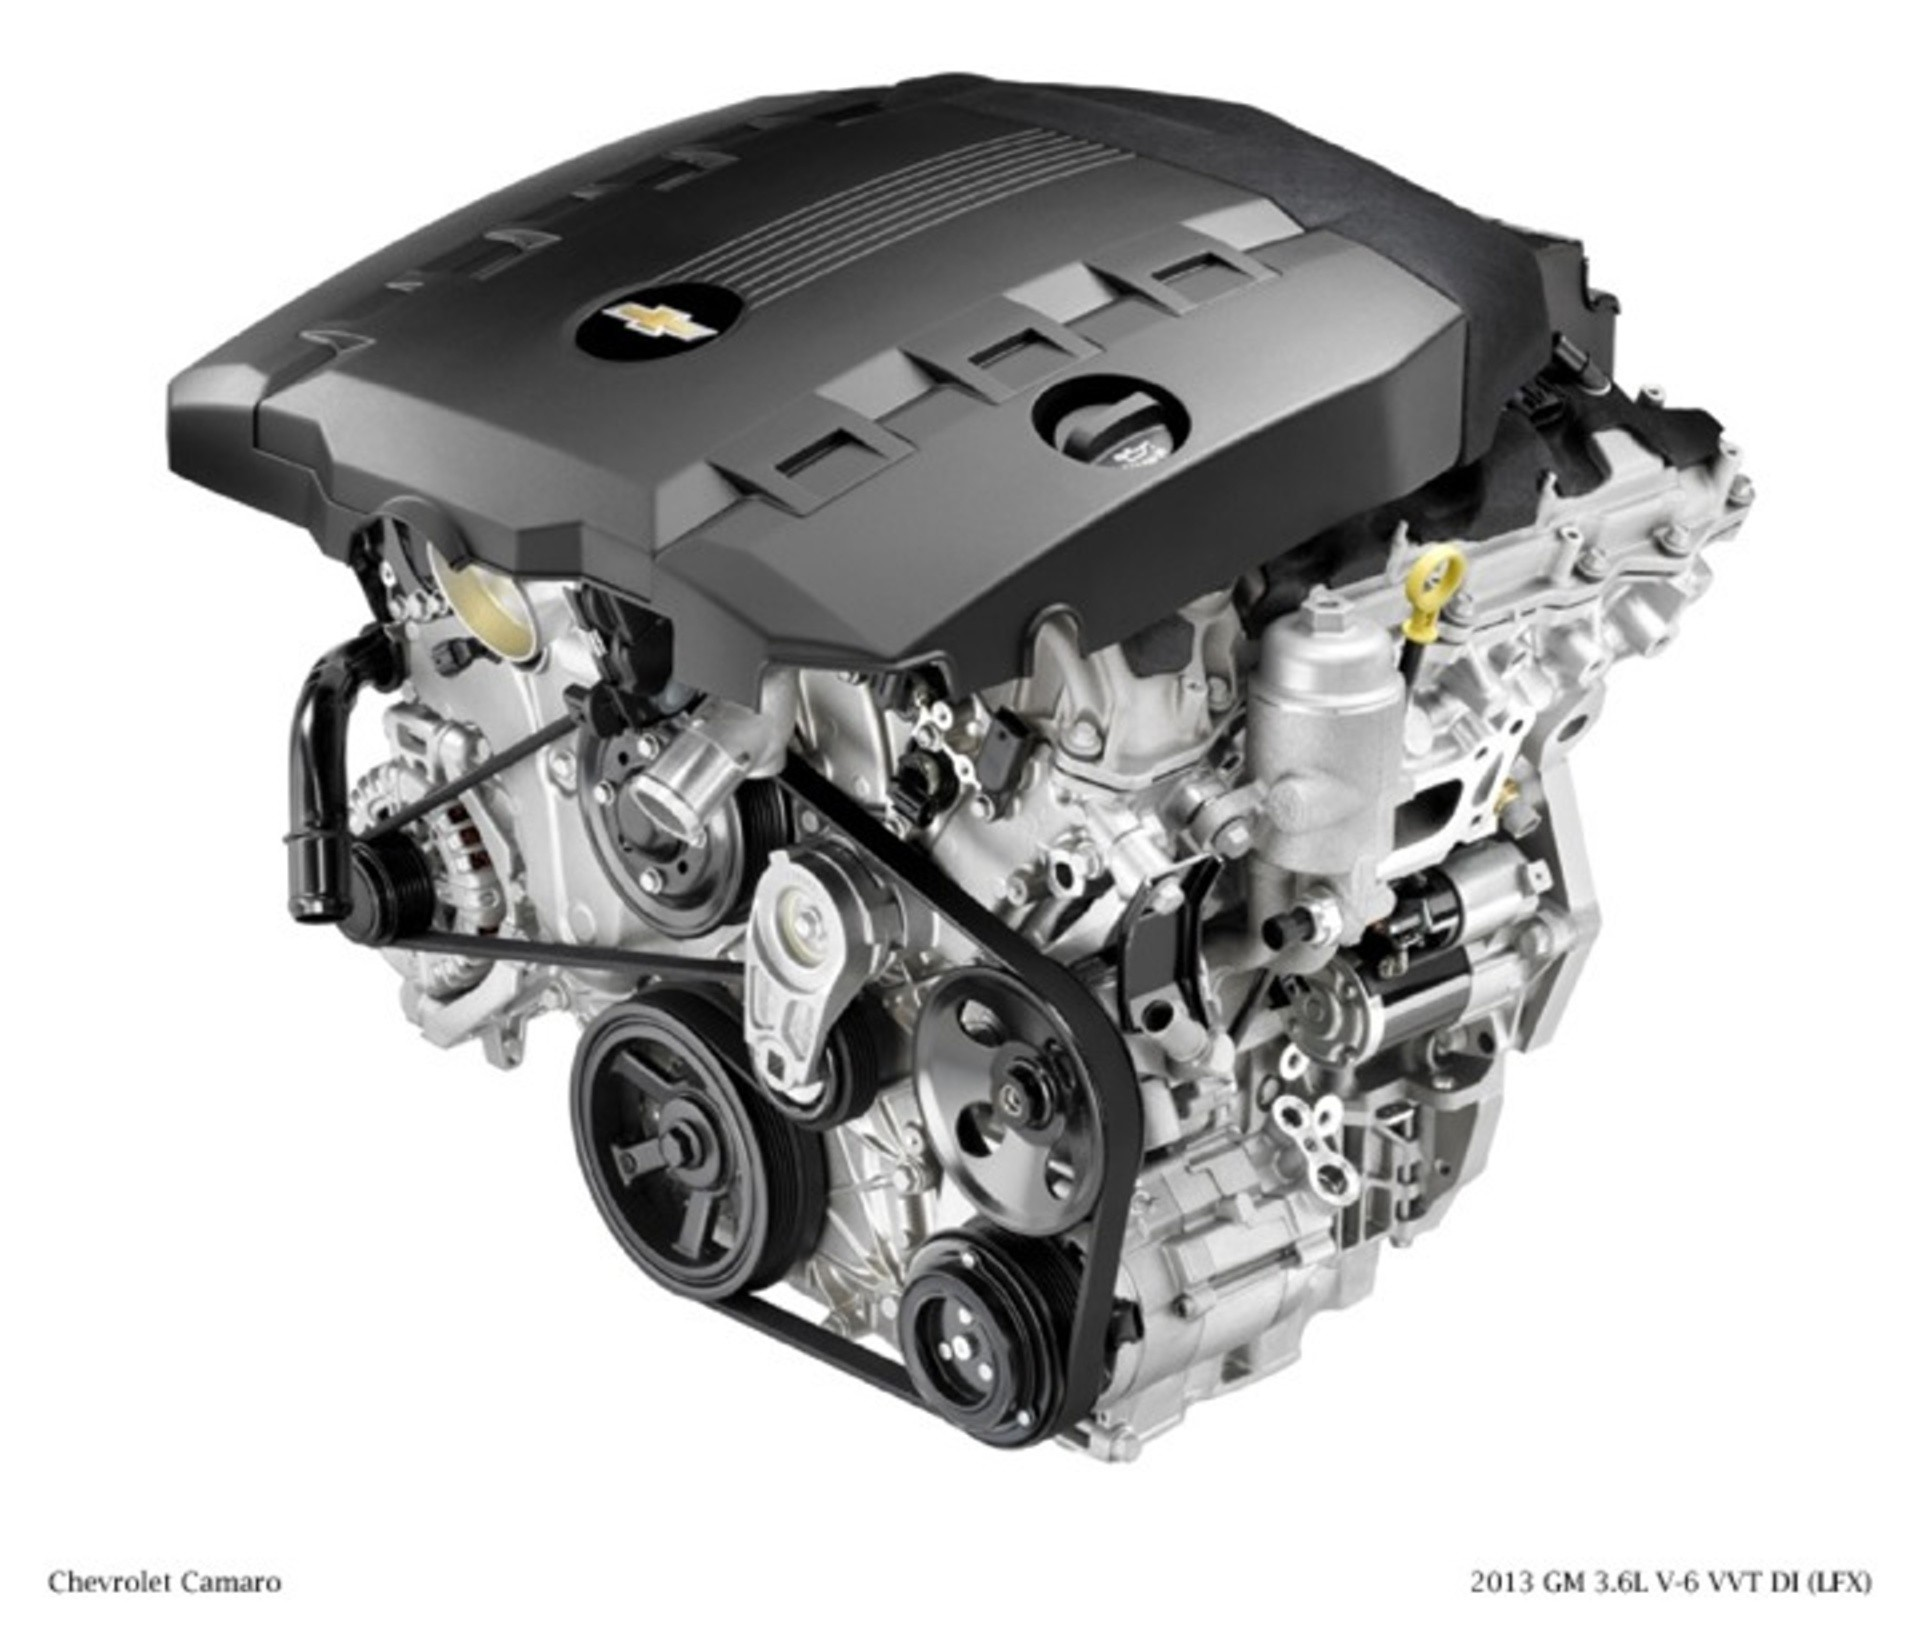 2013 GM 3.6L V-6 VVT DI (LFX) for Chevrolet Camaro